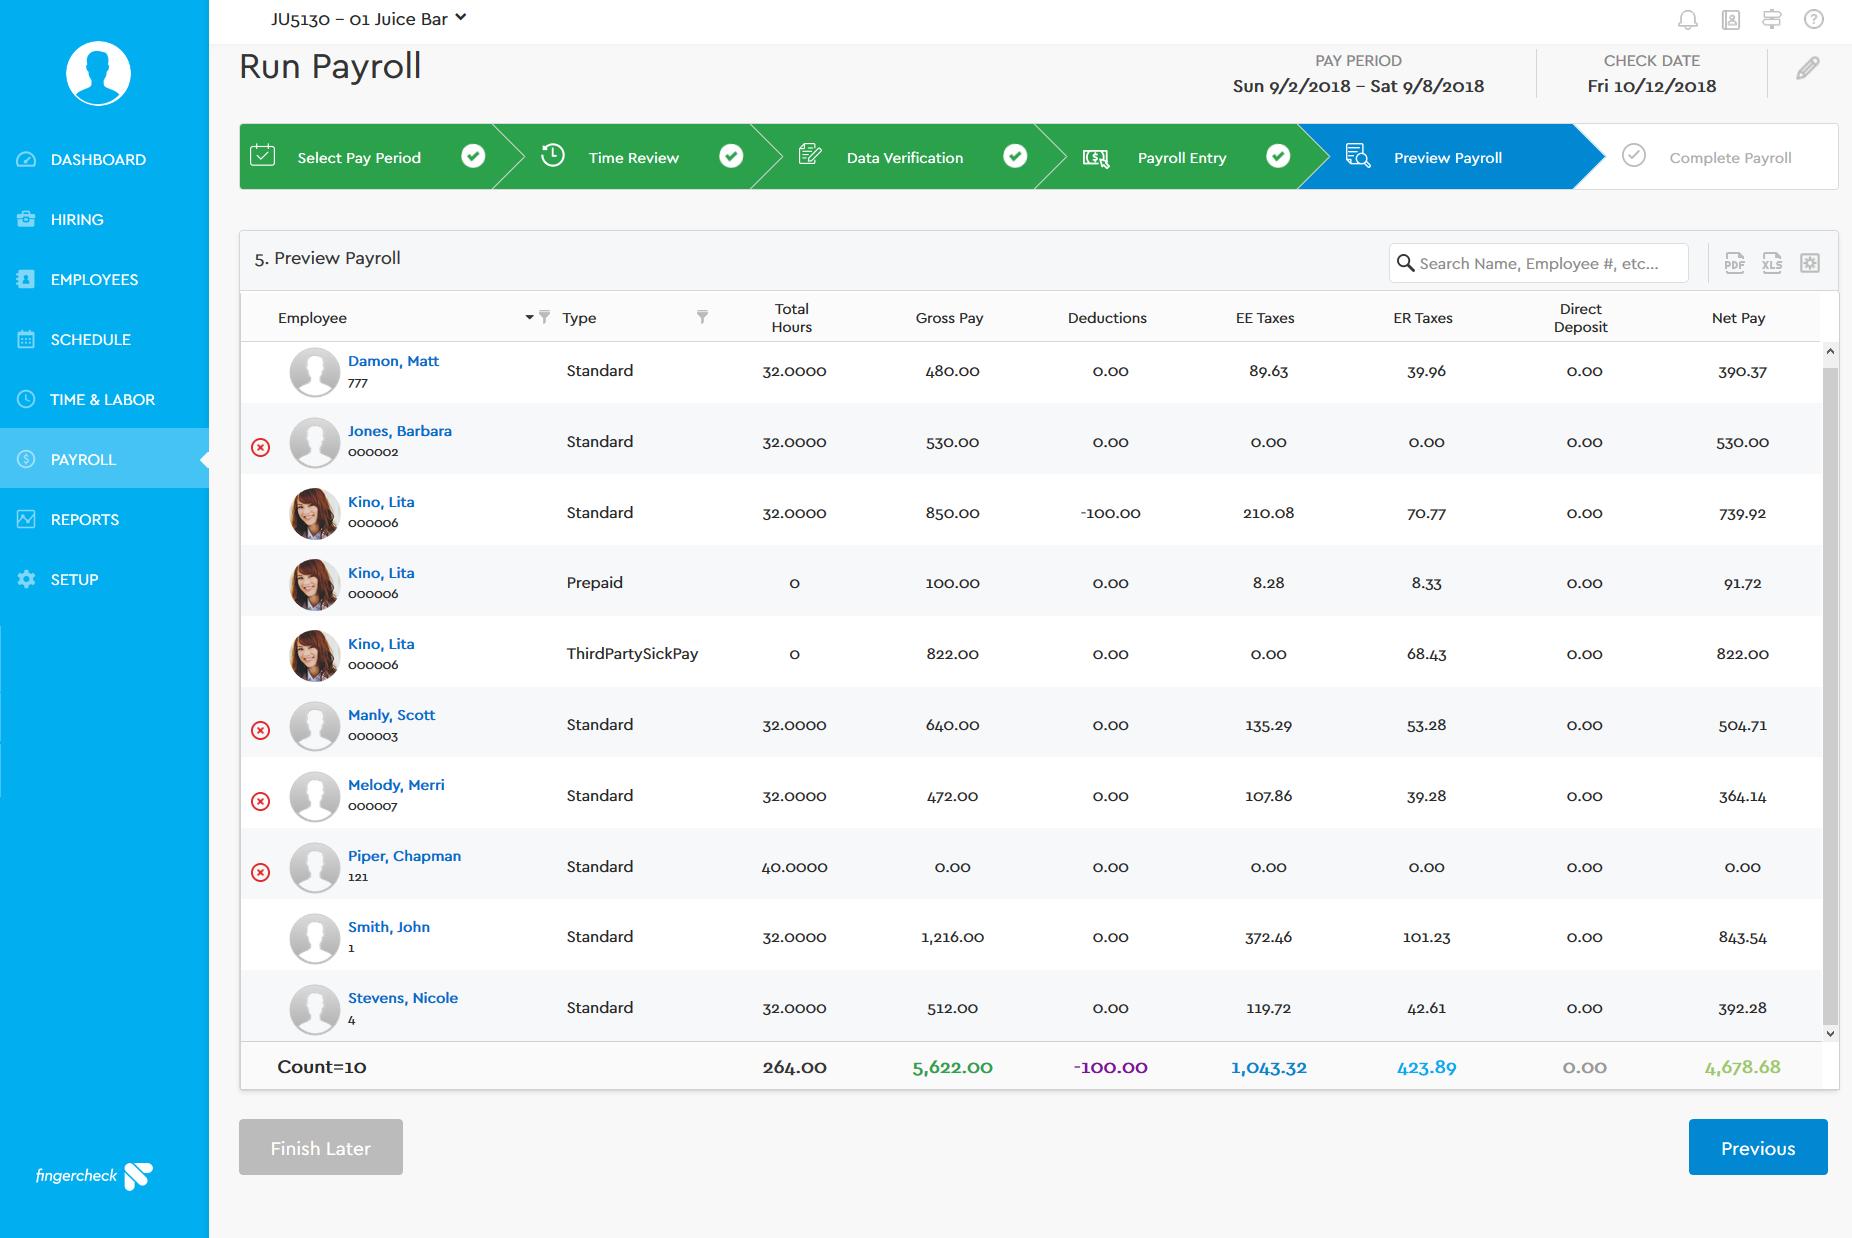 Fingercheck Demo - Run Payroll